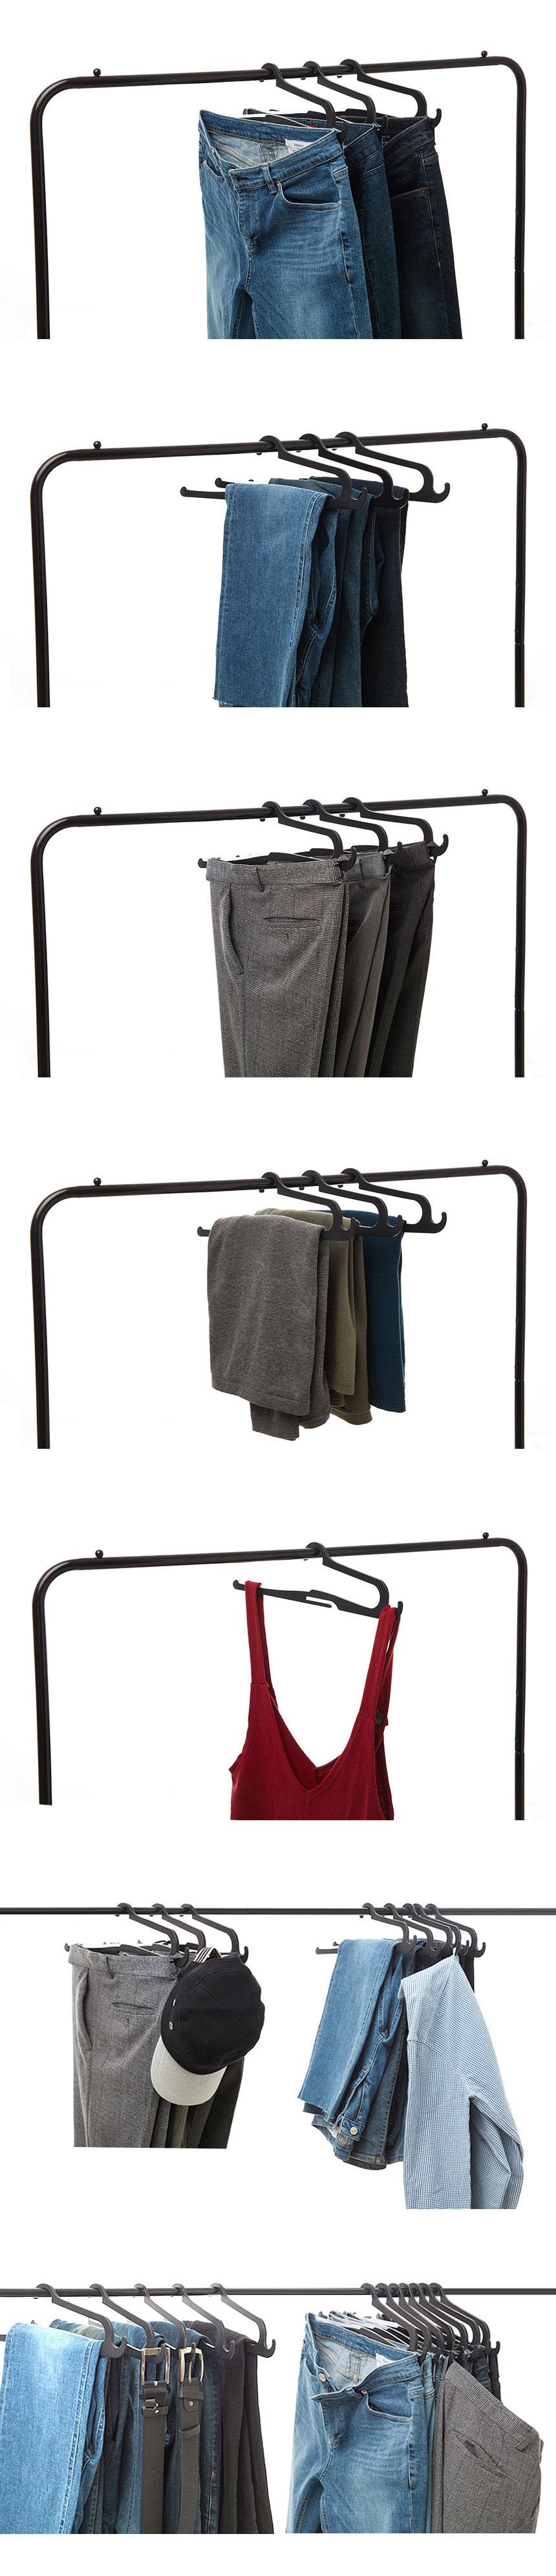 Hurdle Hanger